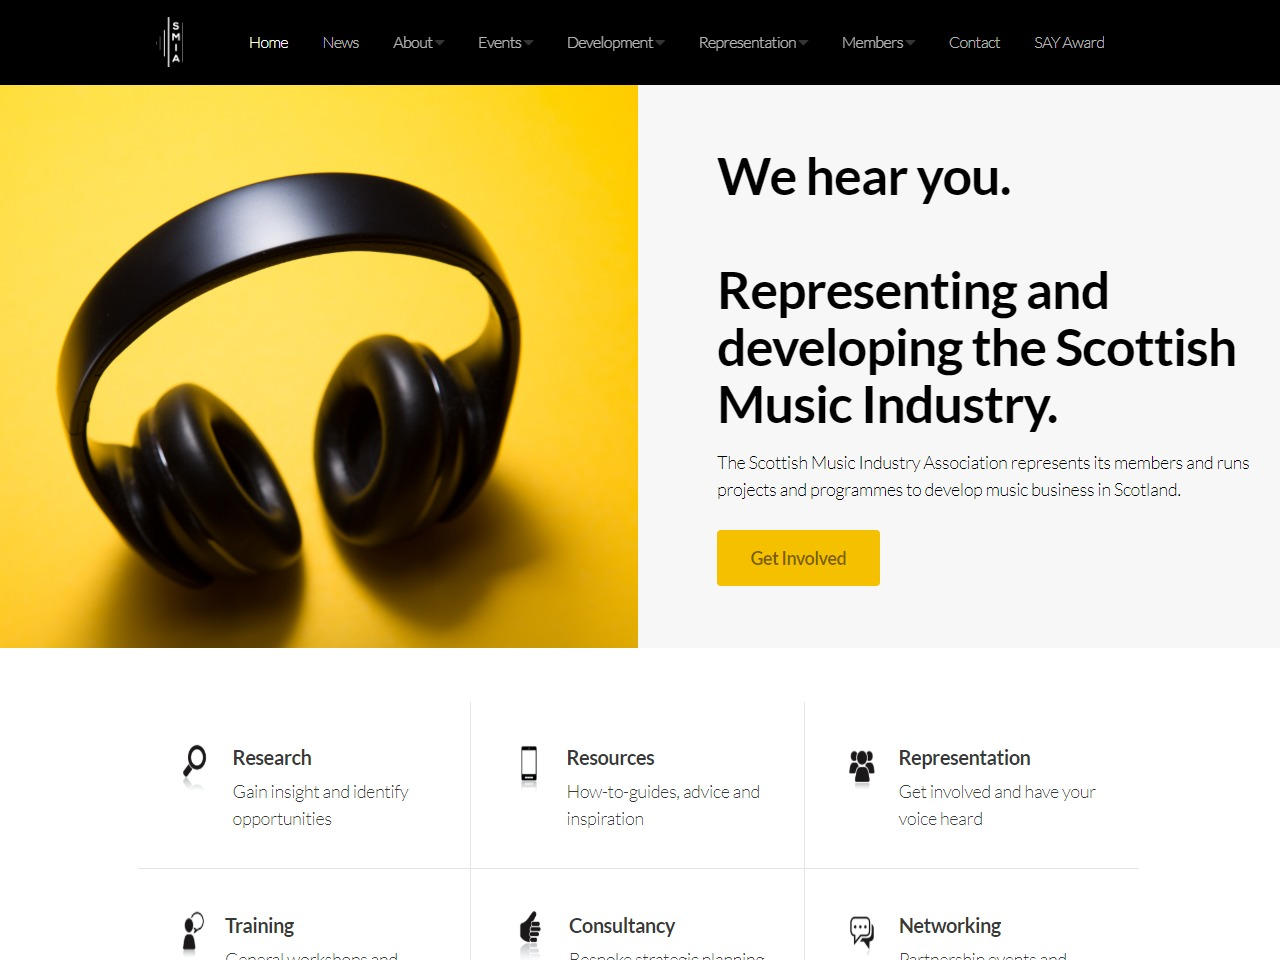 the scottish music industry association